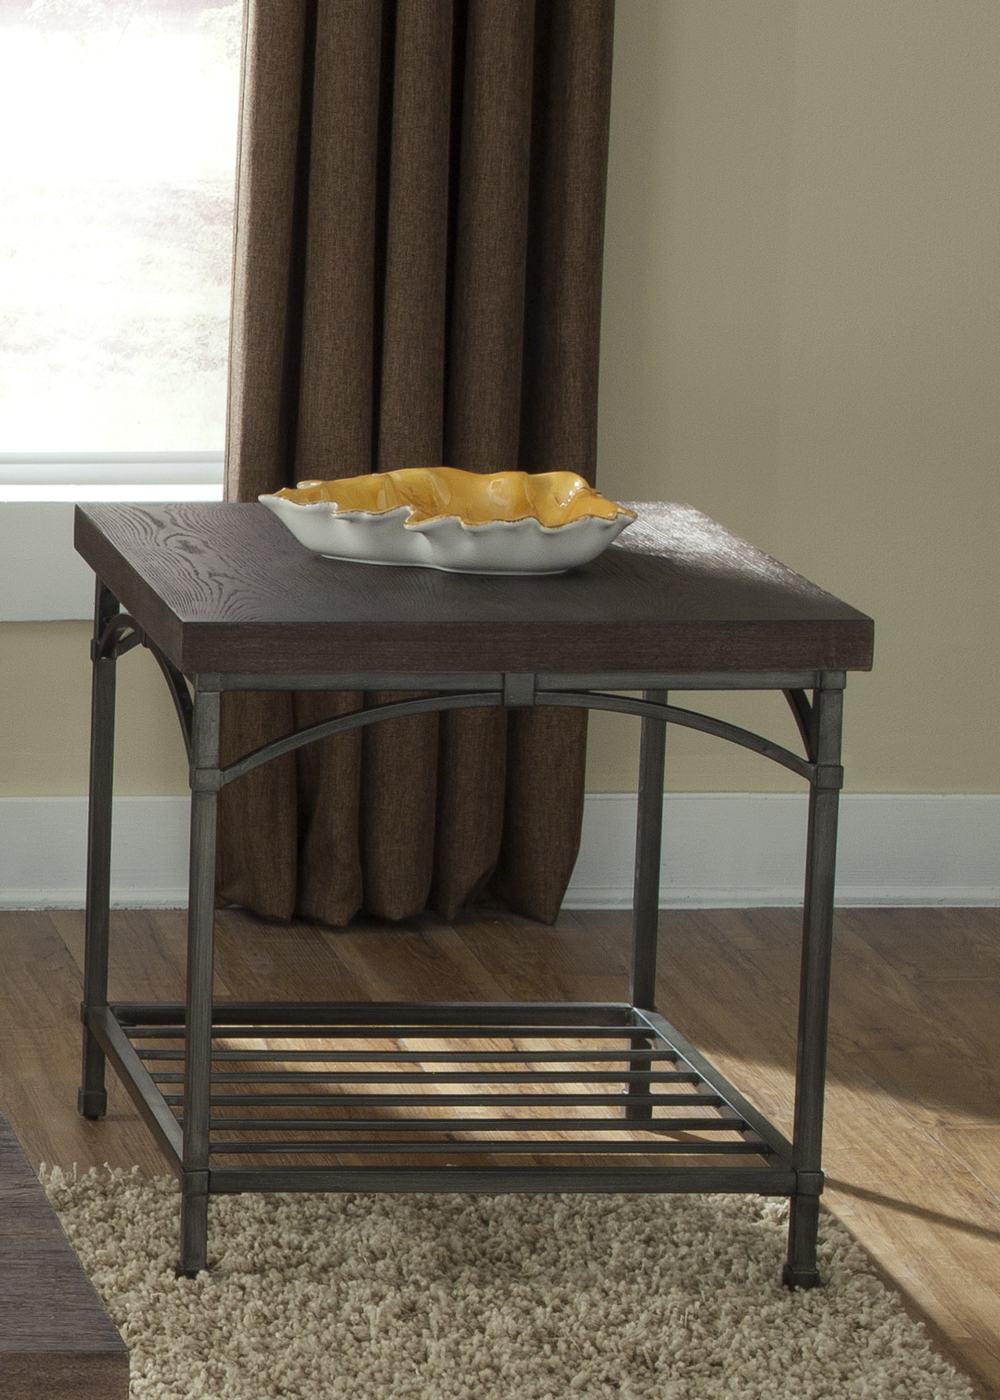 Liberty Furniture - Rustic Metal End Table w/ Storage Shelf